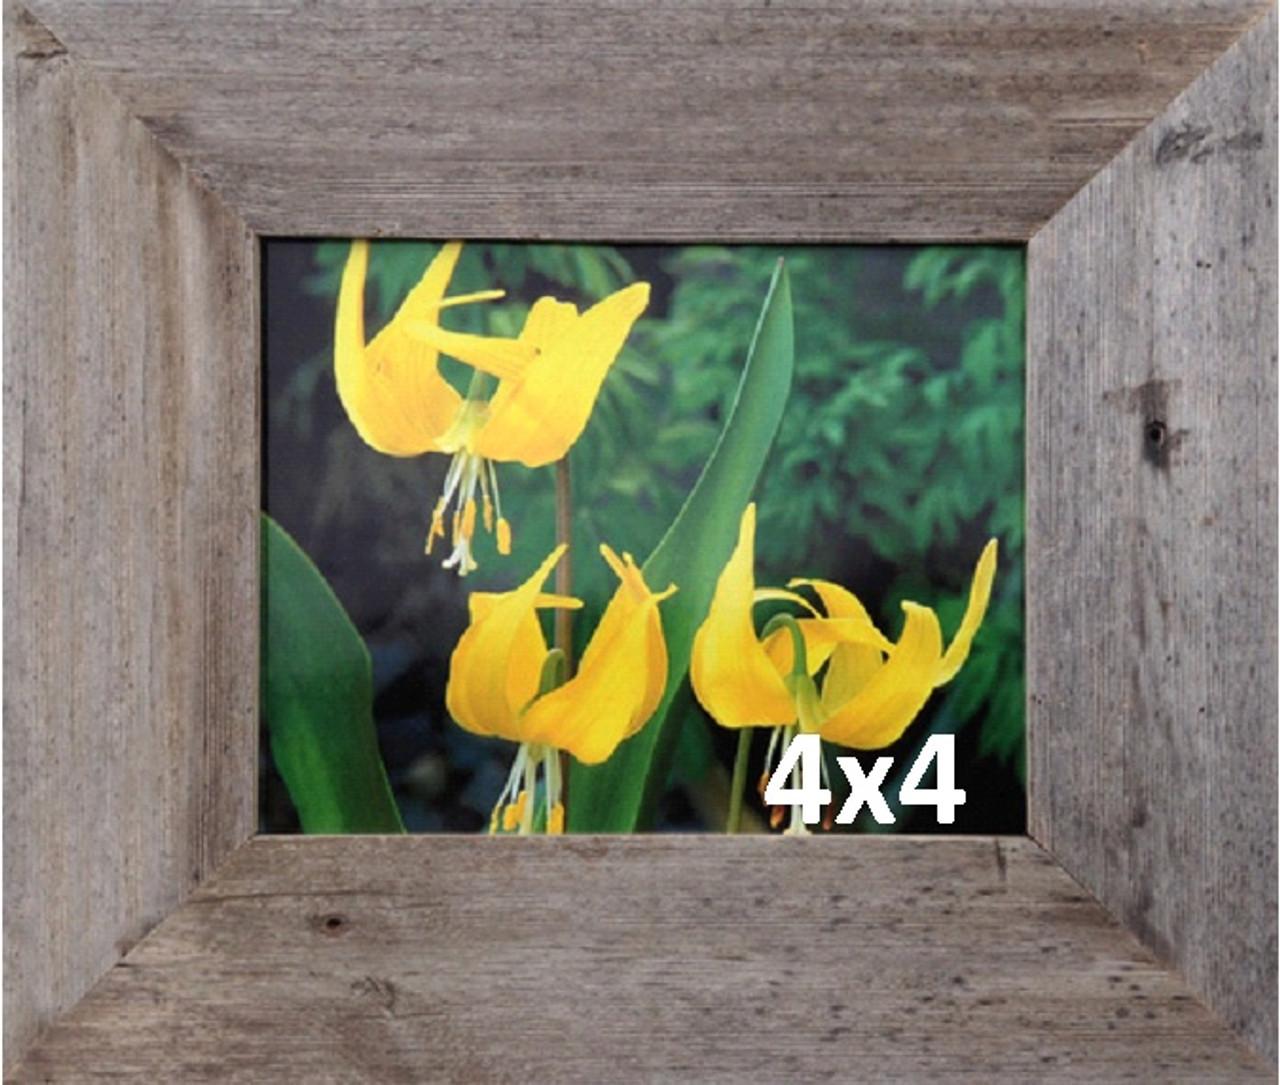 4x4 Barnwood Frames, Wide Width 3 inch Homestead Series